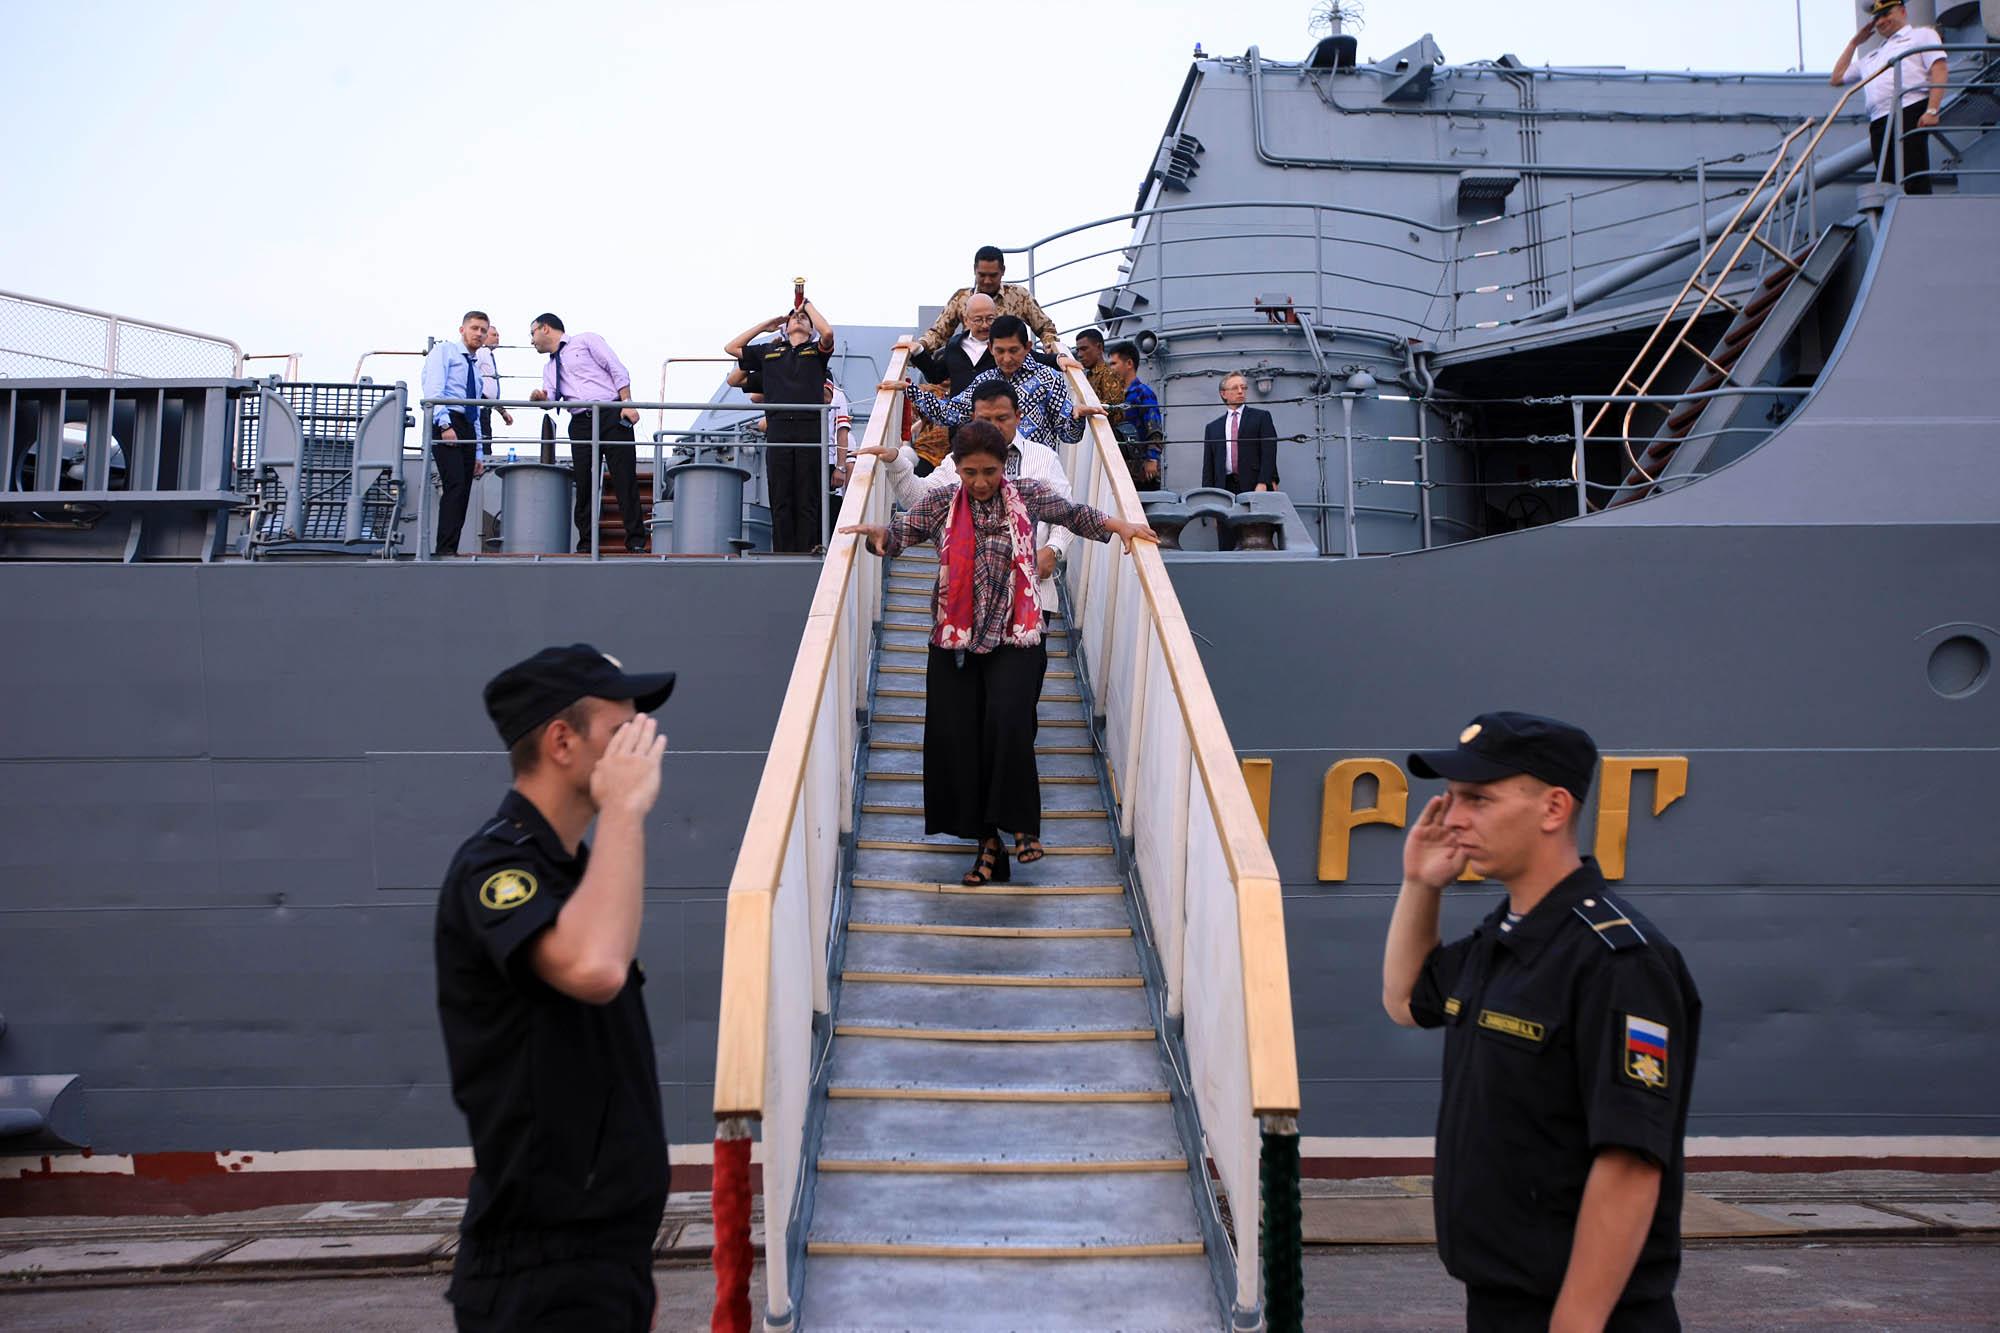 Menteri Kelautan dan Perikanan Susi Pudji Astuti menuruni tangga seusai mengujungi kapal jelajah 'Varyag' di Pelabuhan JICT 2, Tanjung Priok, Jakarta, Selasa (23/5).